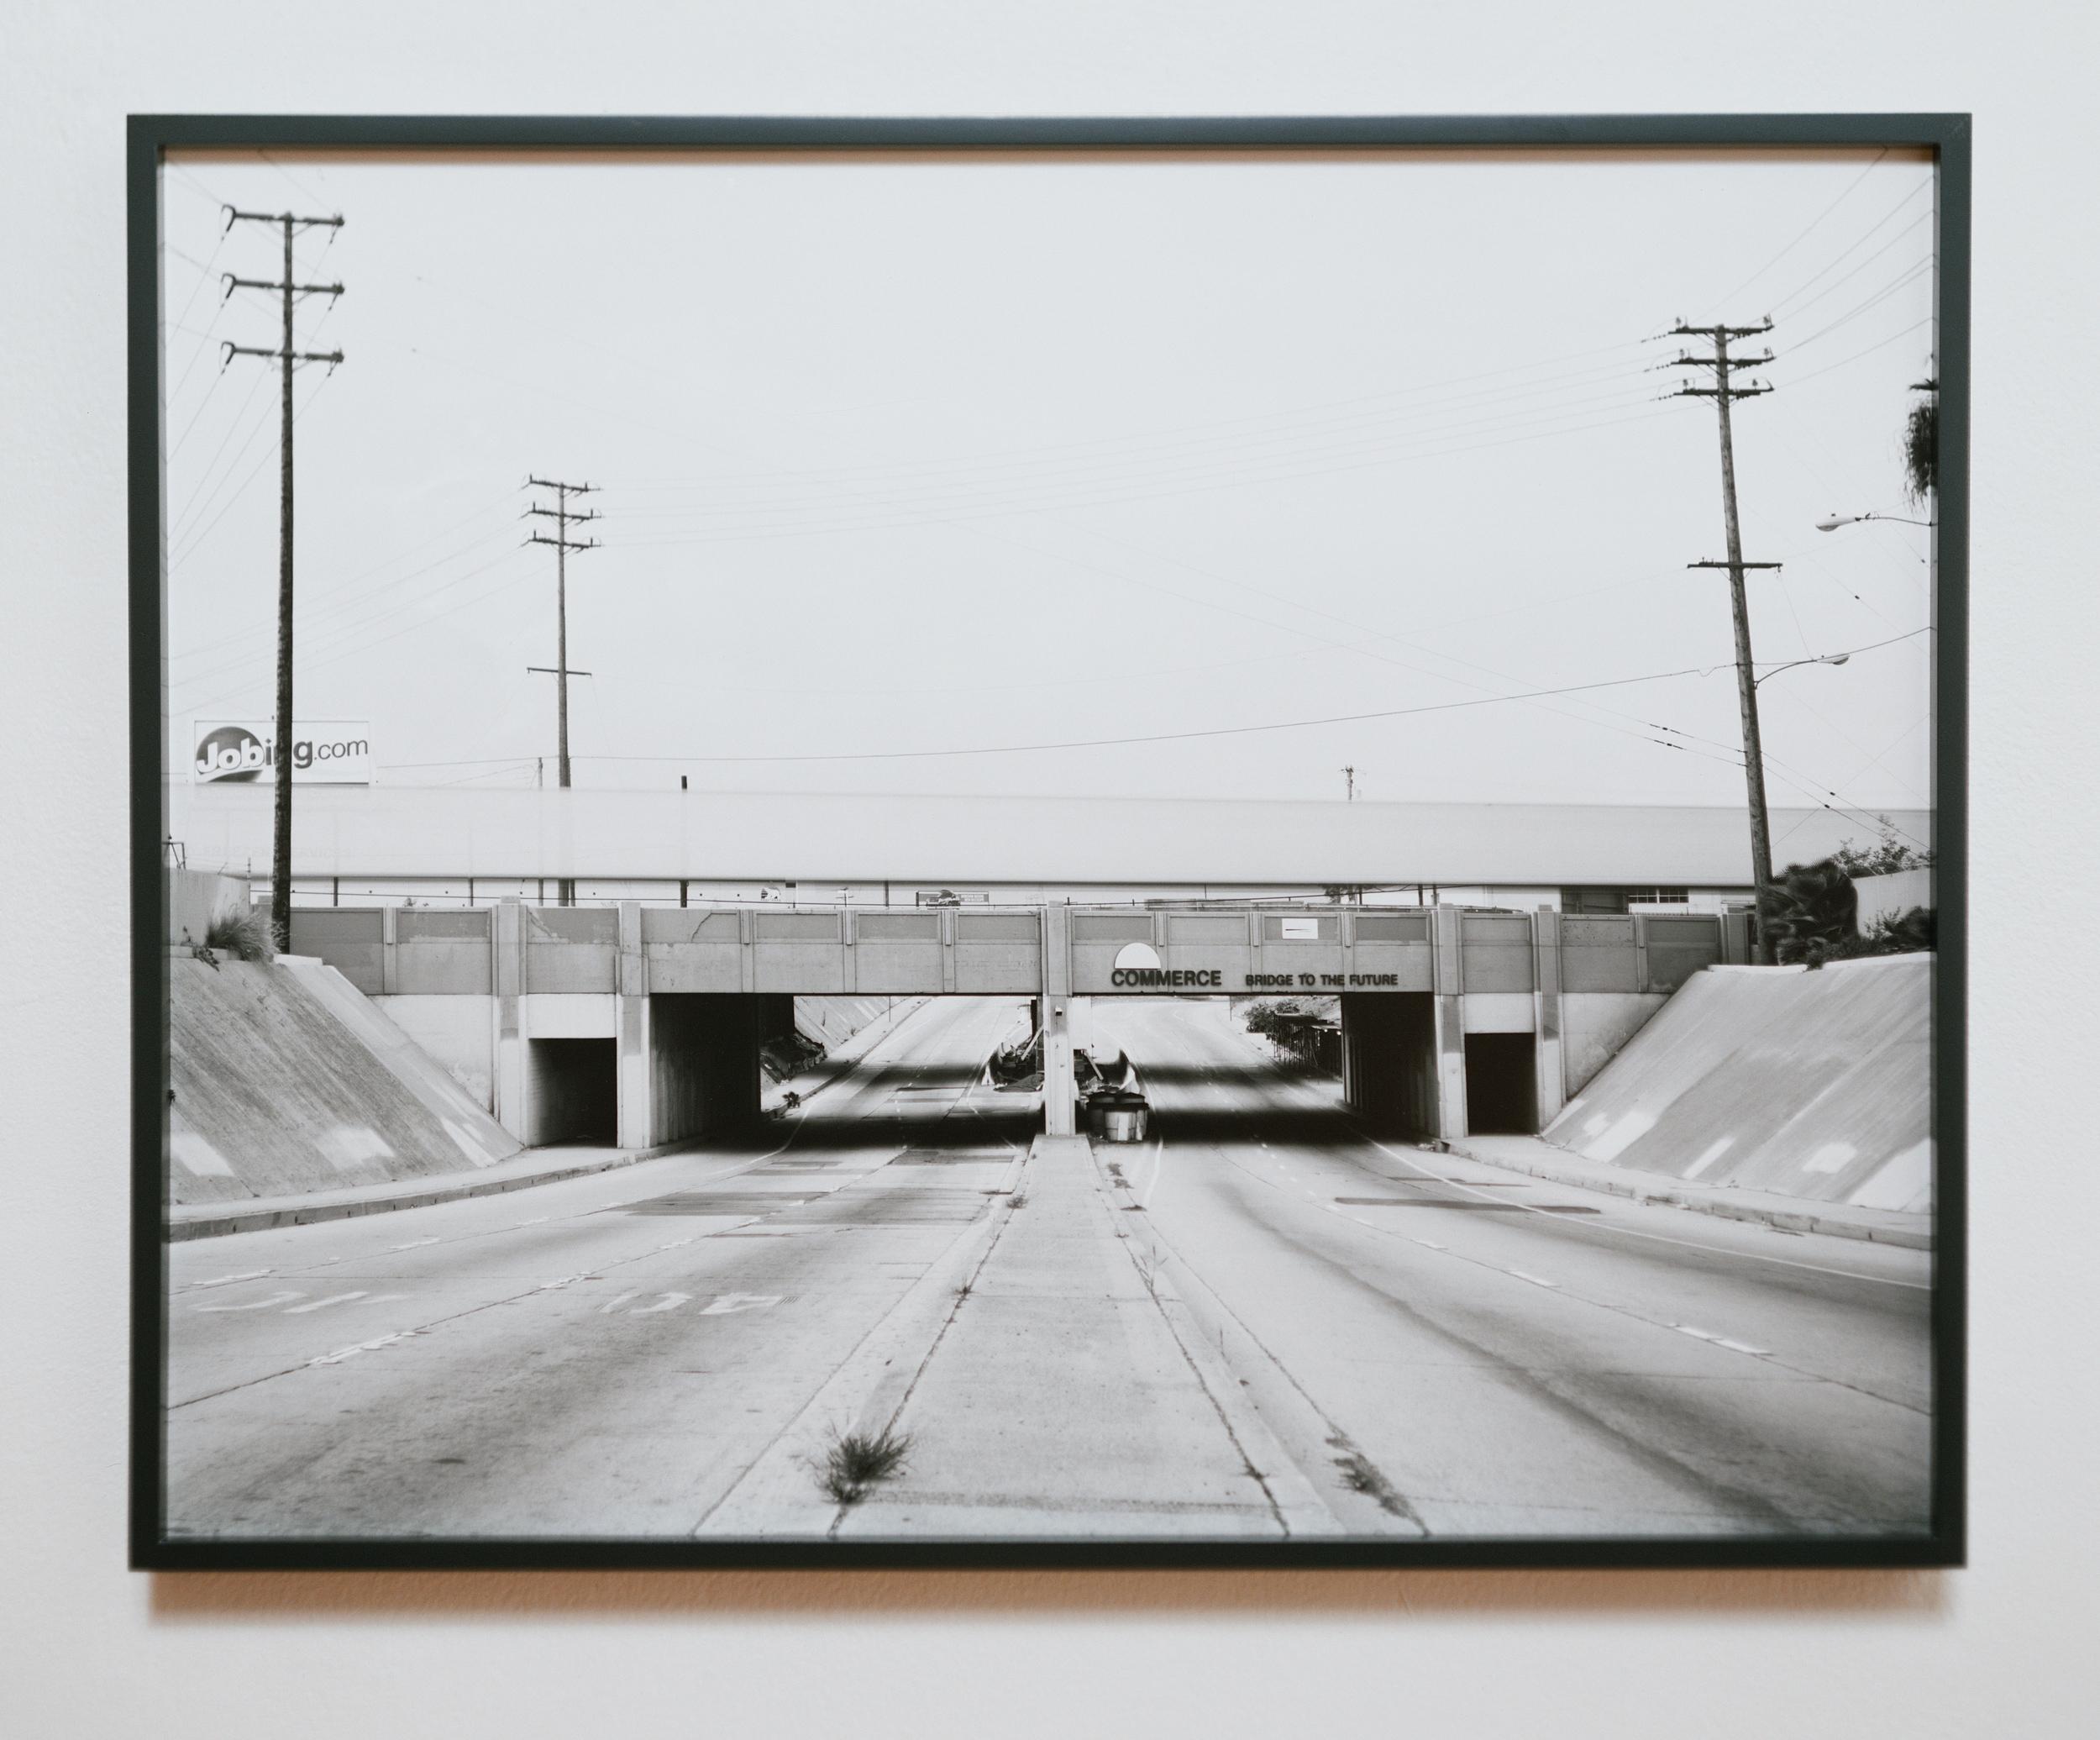 Atlantic Crossing (Bridge to the Future) 2007 gelatin silver print on Dibond with maple frame